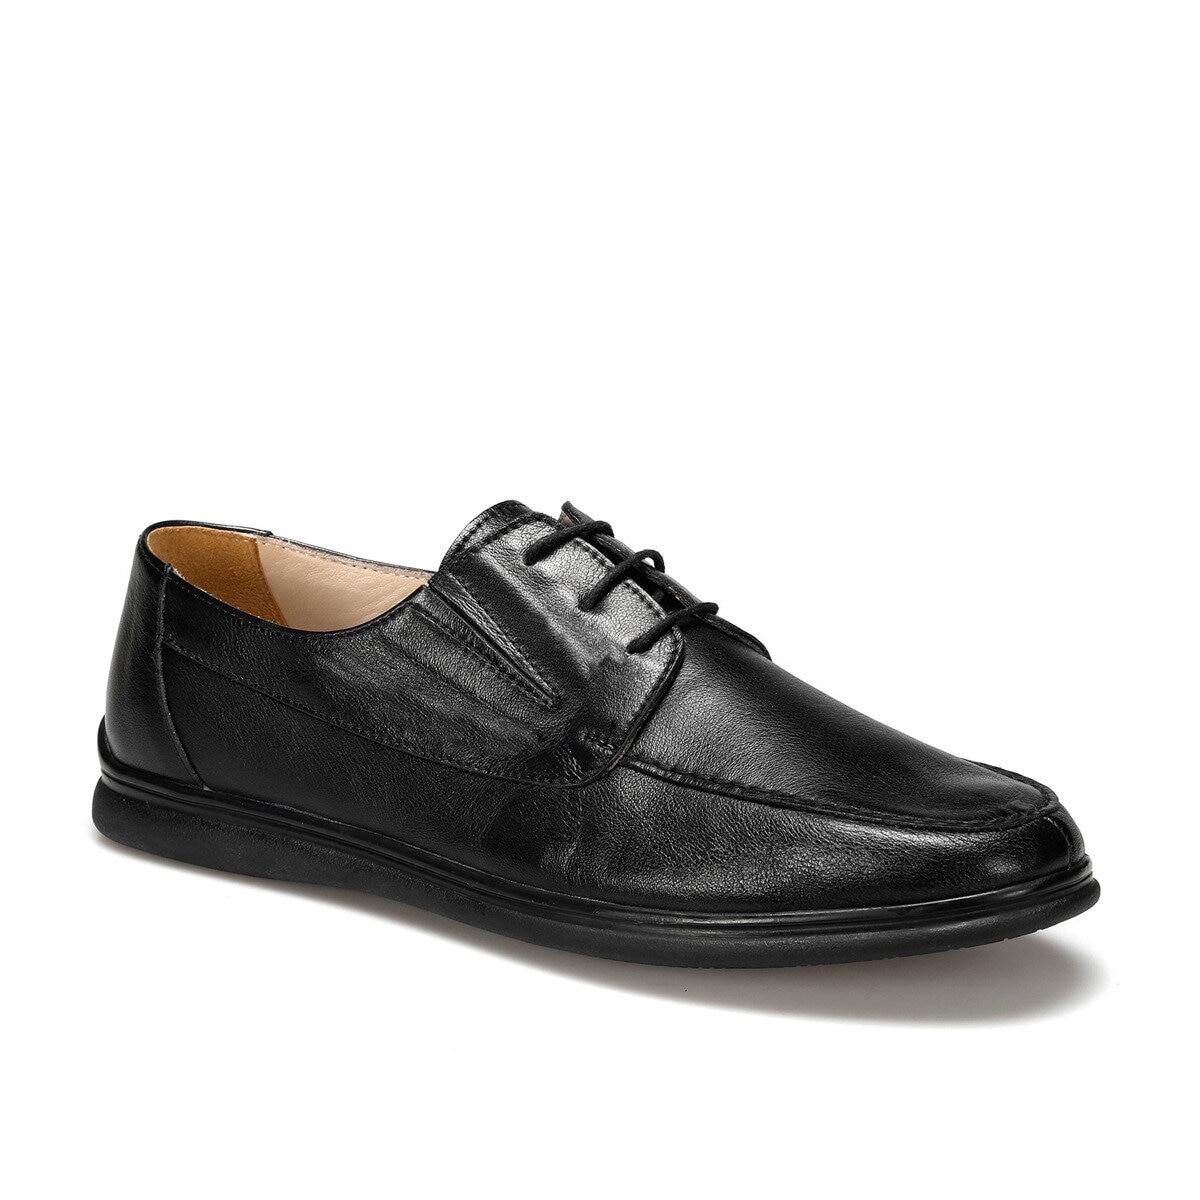 FLO PETERSBURG Black Men Dress Shoes MERCEDES